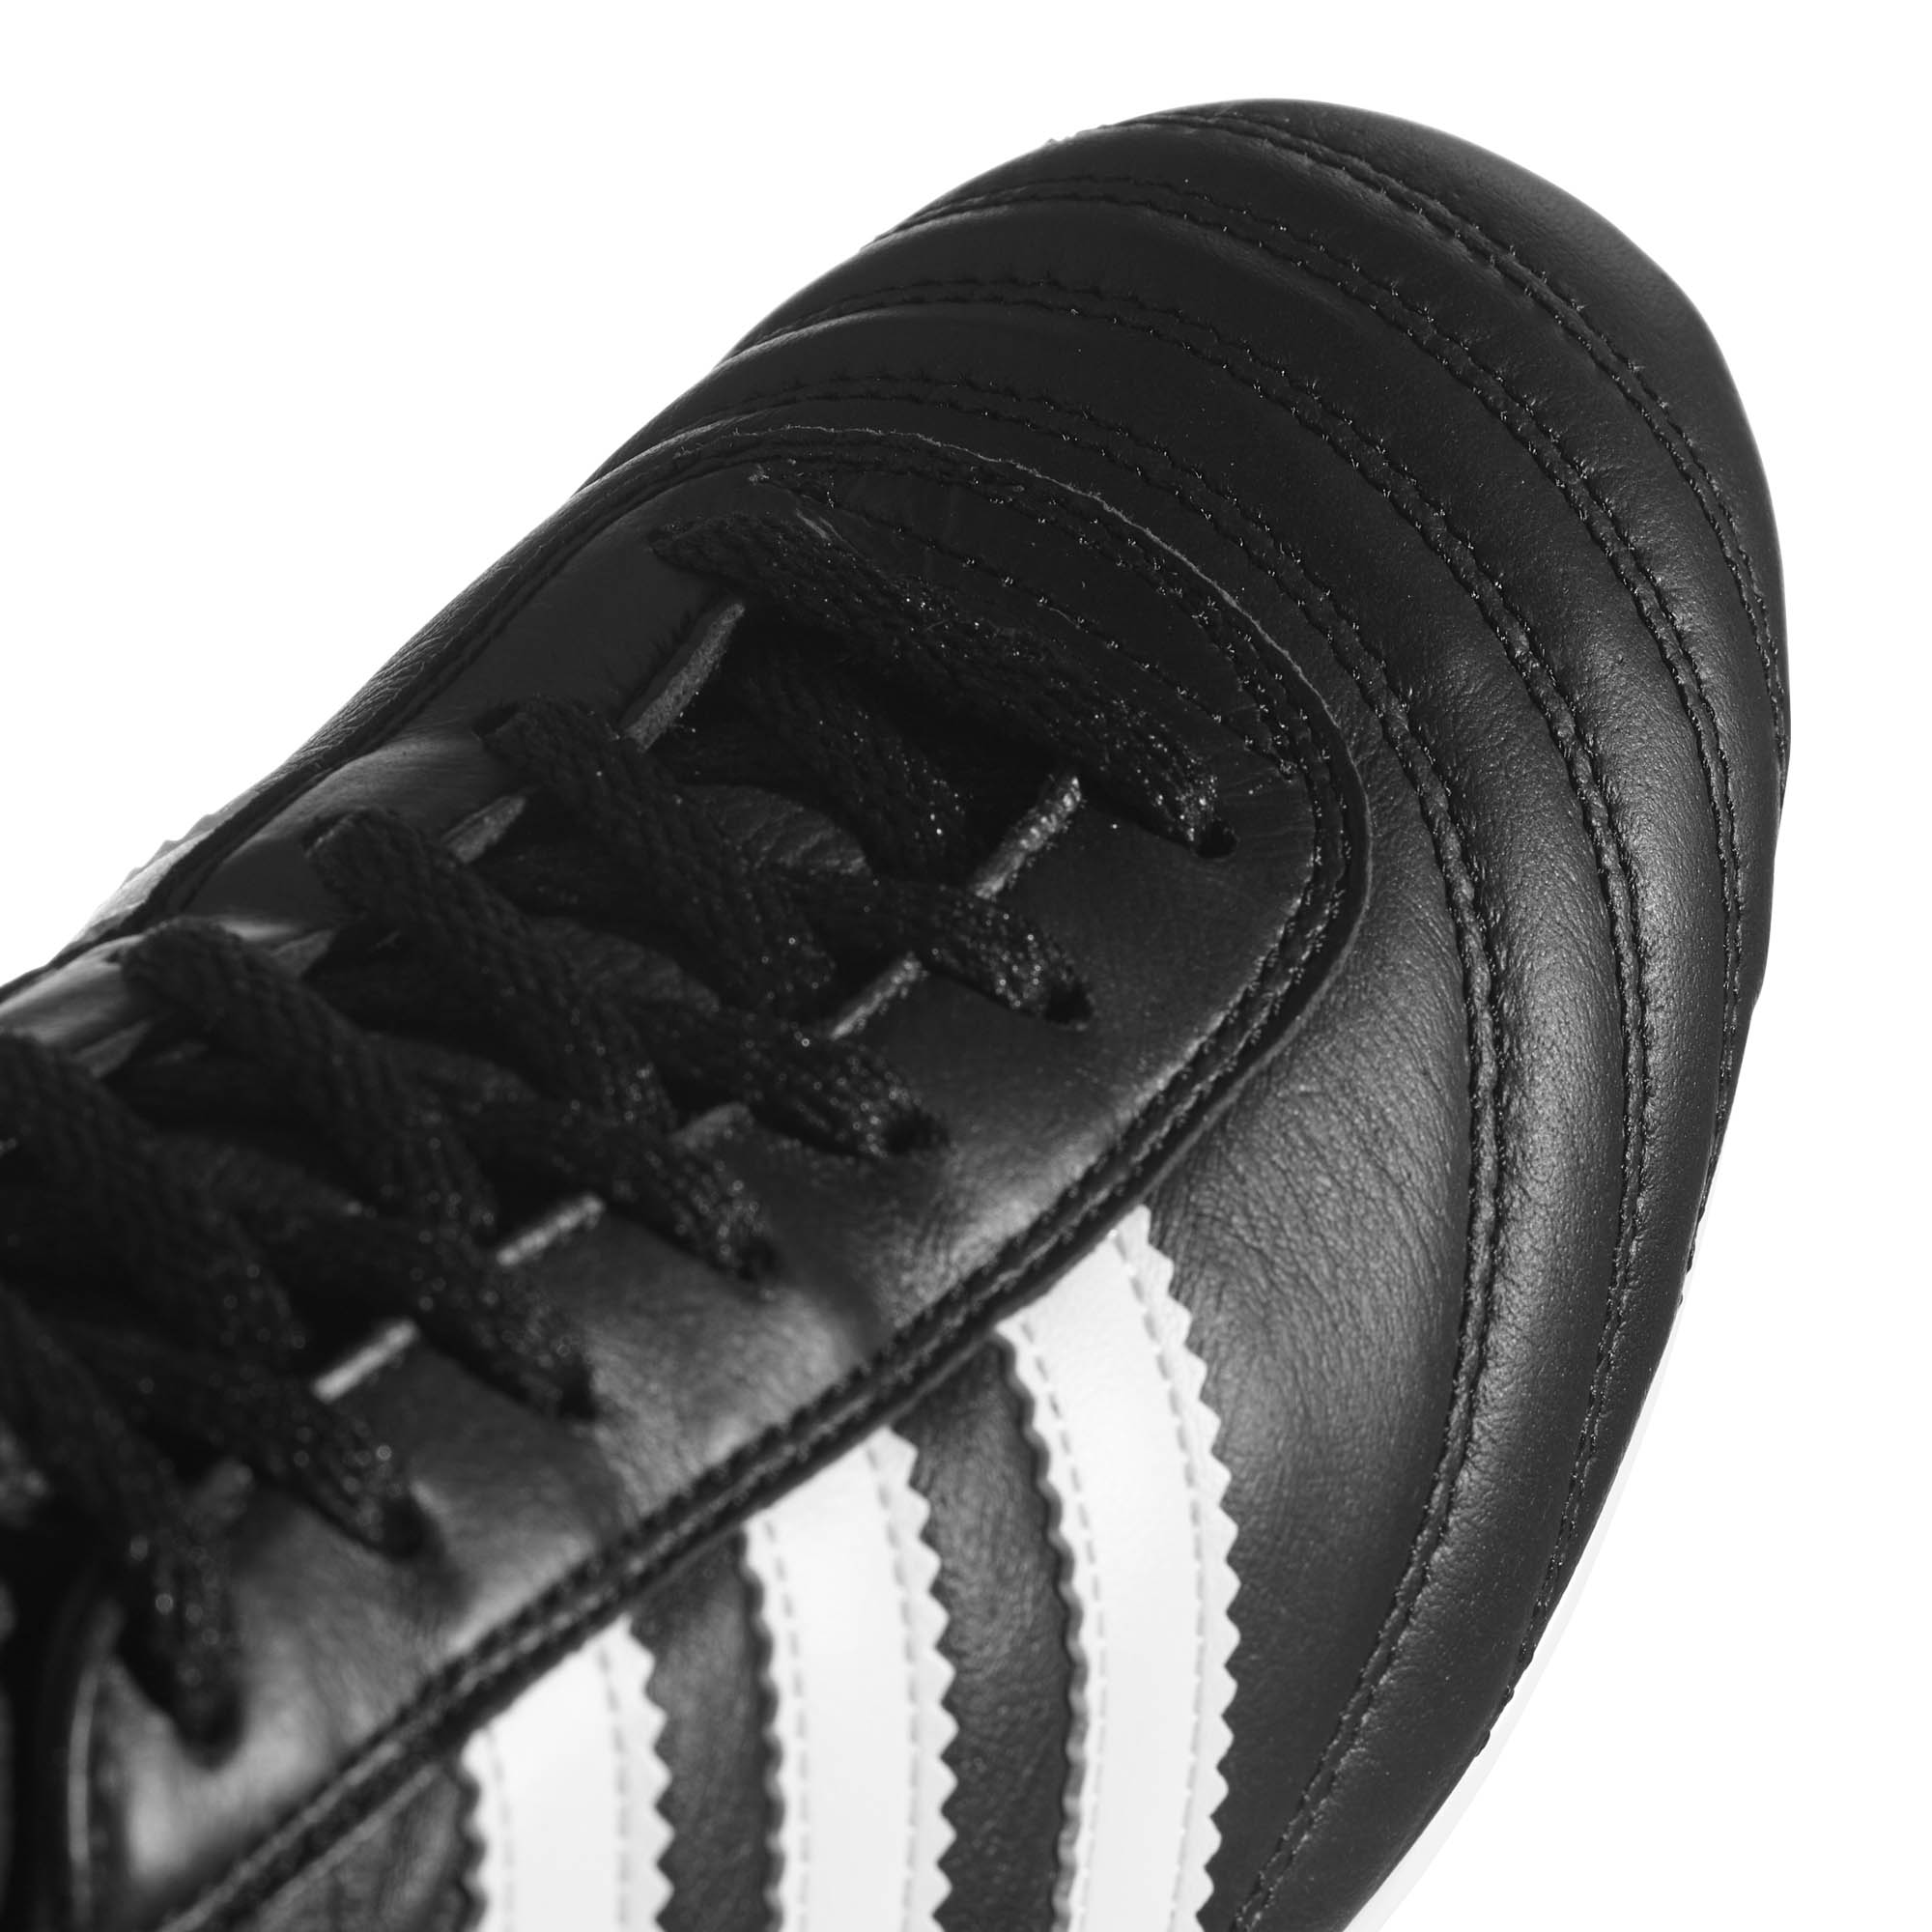 miniature 8 - Adidas-Copa-Mundial-FG-Firm-Ground-pour-homme-Football-Boot-Noir-Blanc